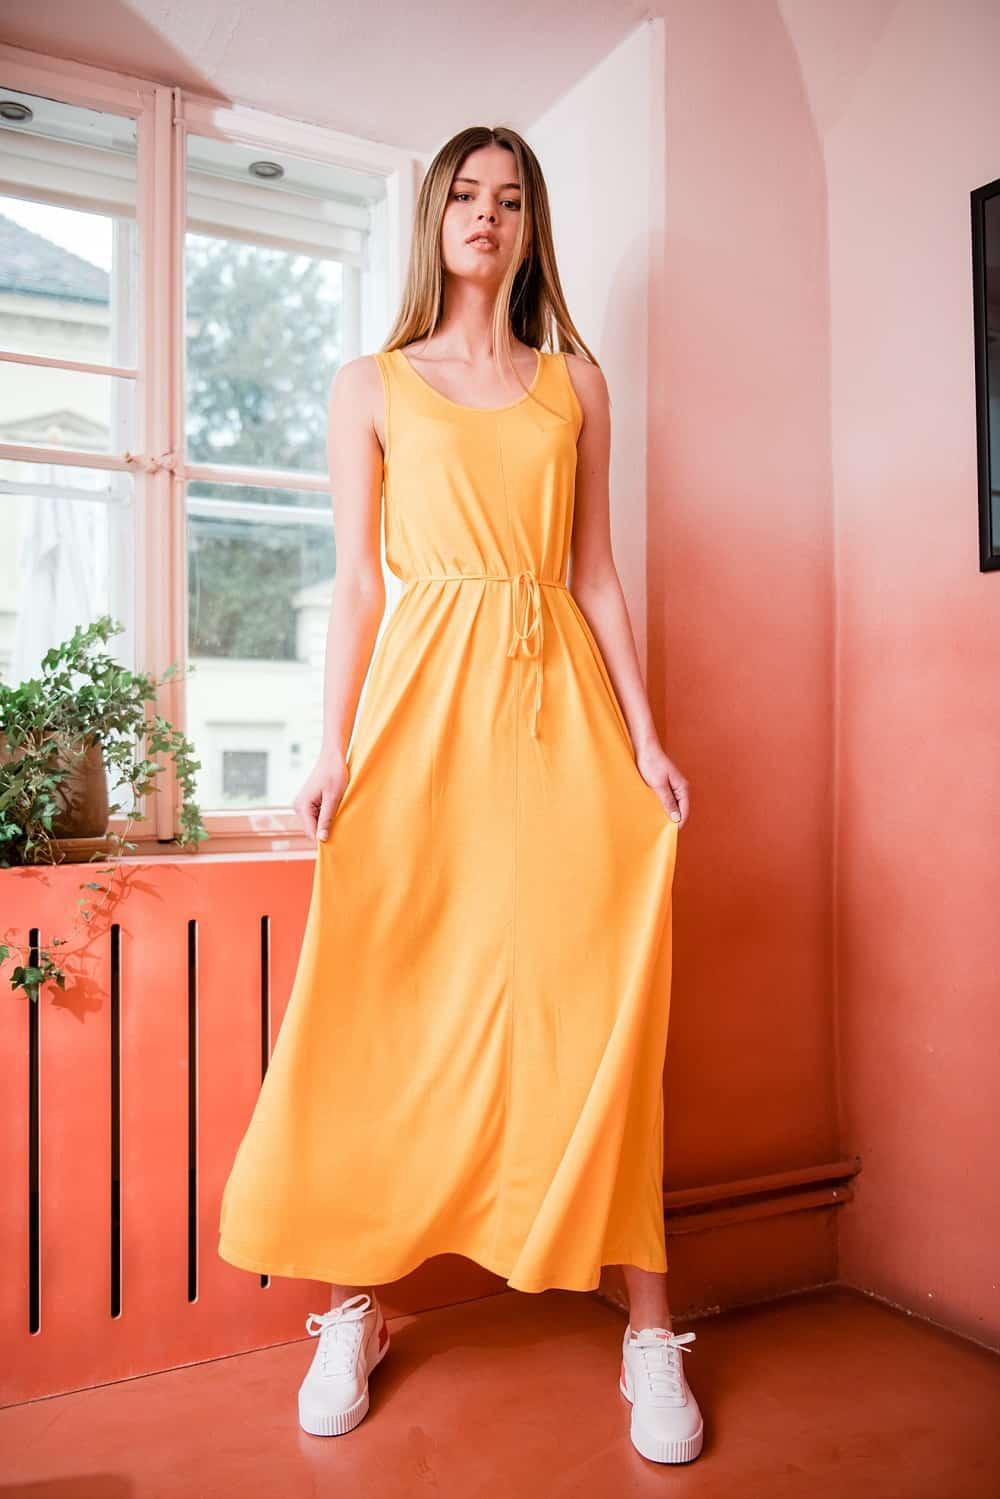 LIDL modni editorijal Esmara kolekcija 2021.